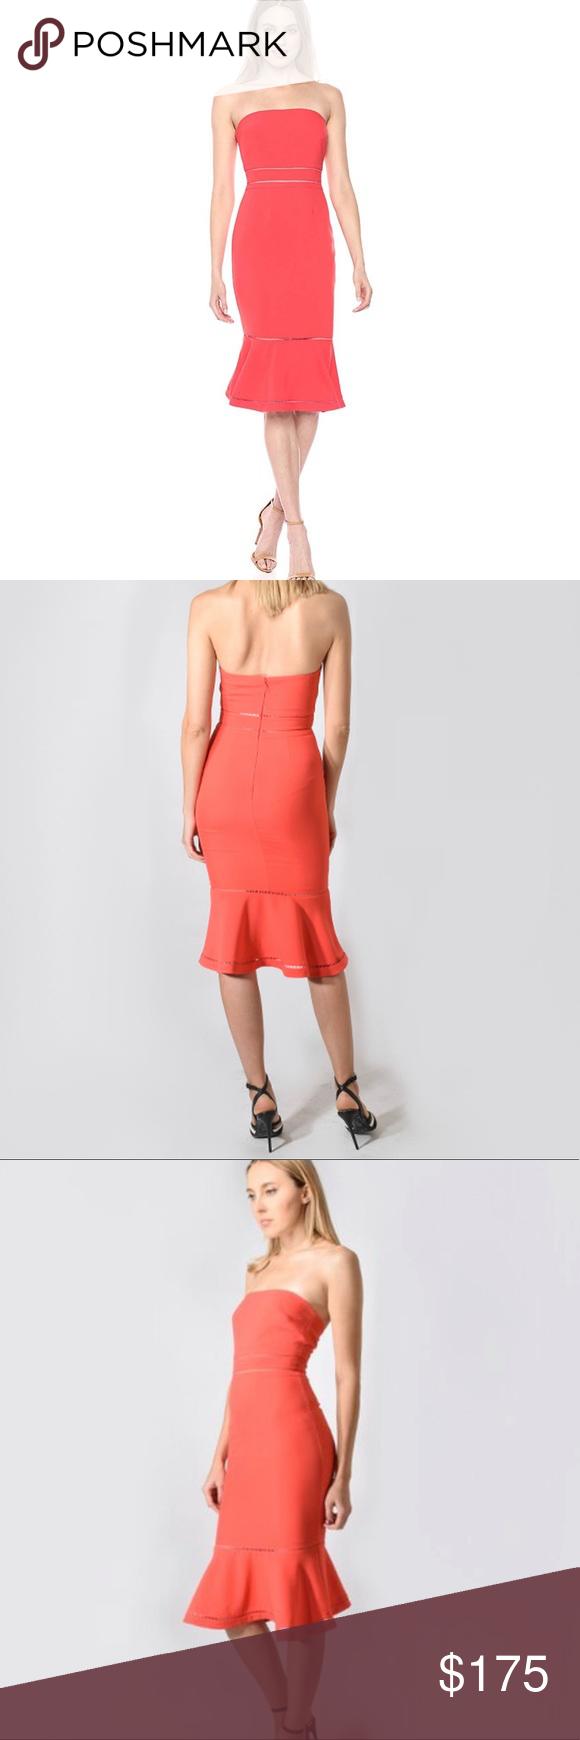 Likely Abbott Strapless Ruffle Dress Salmon Pink Likely Abbott Strapless Ruffle Dress Salmon Pink Made For Summer Strapless Ruffle Dress Ruffle Dress Dresses [ 1740 x 580 Pixel ]